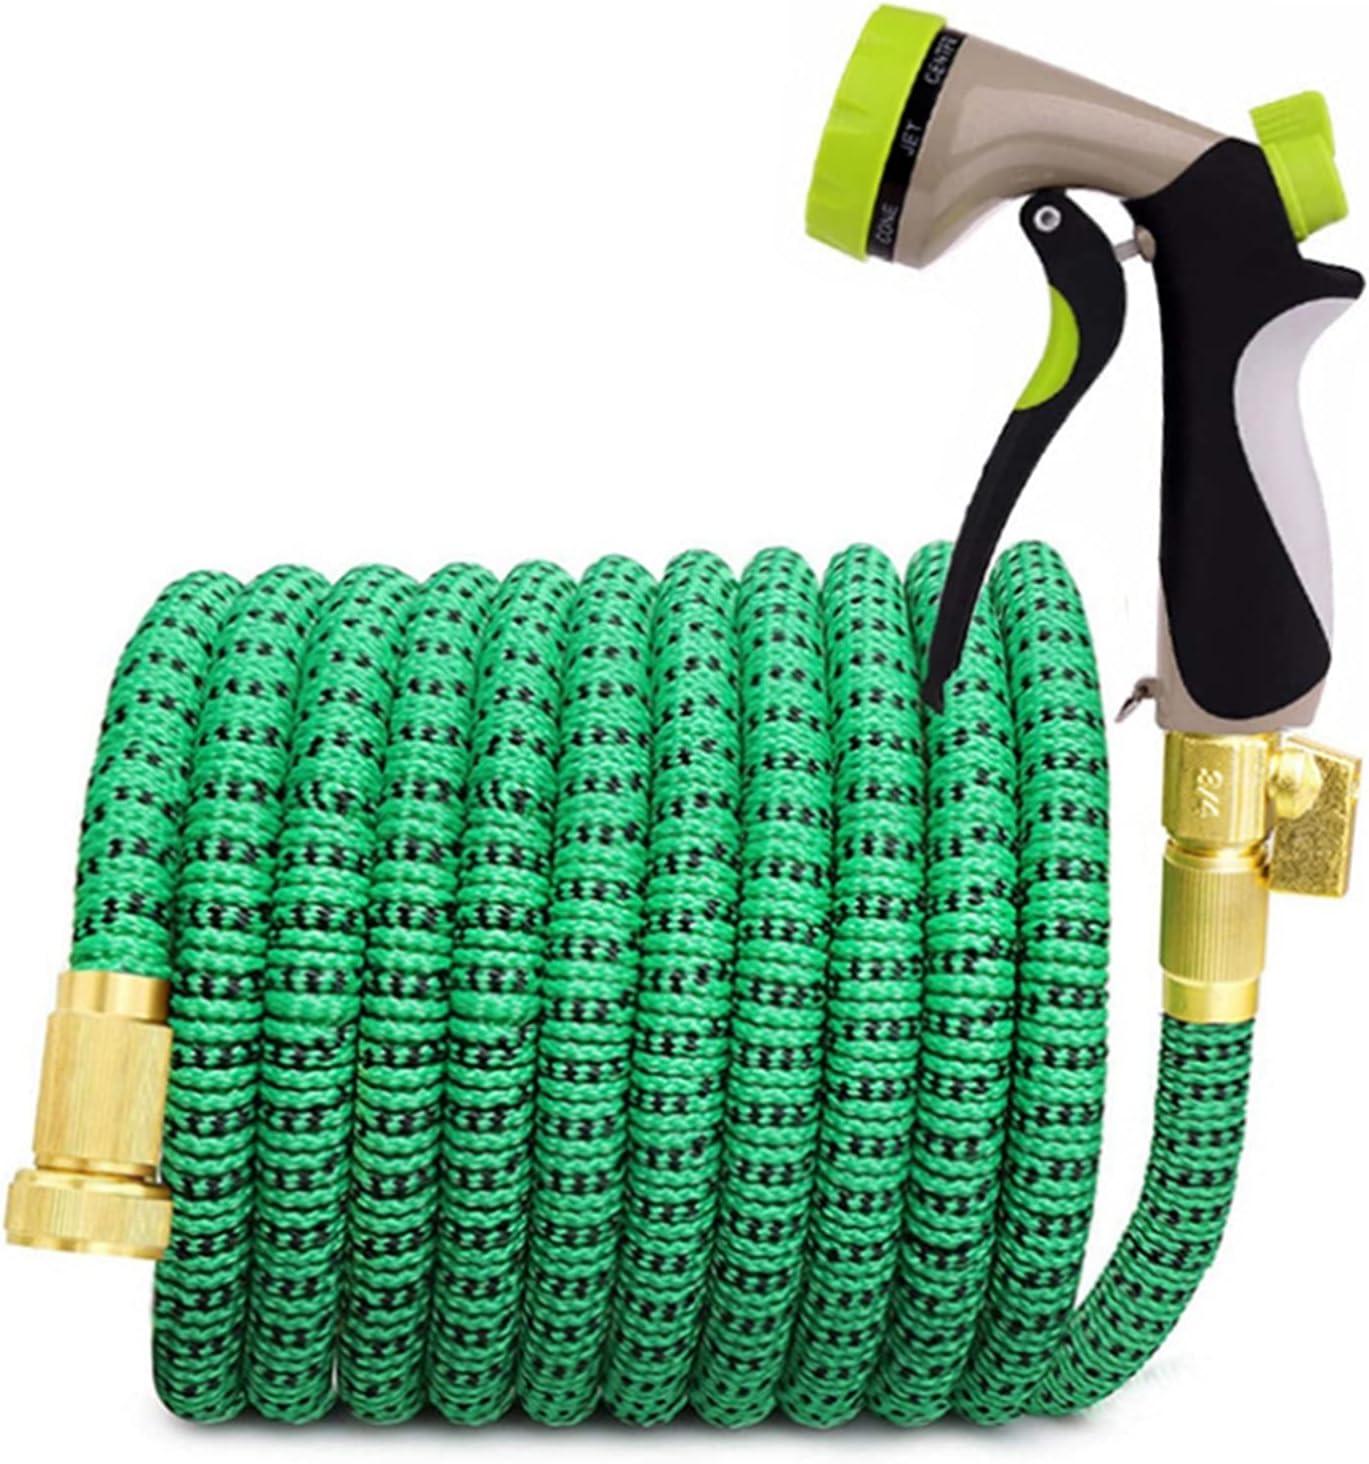 Daily bargain sale Garden Hose Manufacturer OFFicial shop Pipe Expandable Leakproof Duty Heavy Flexible